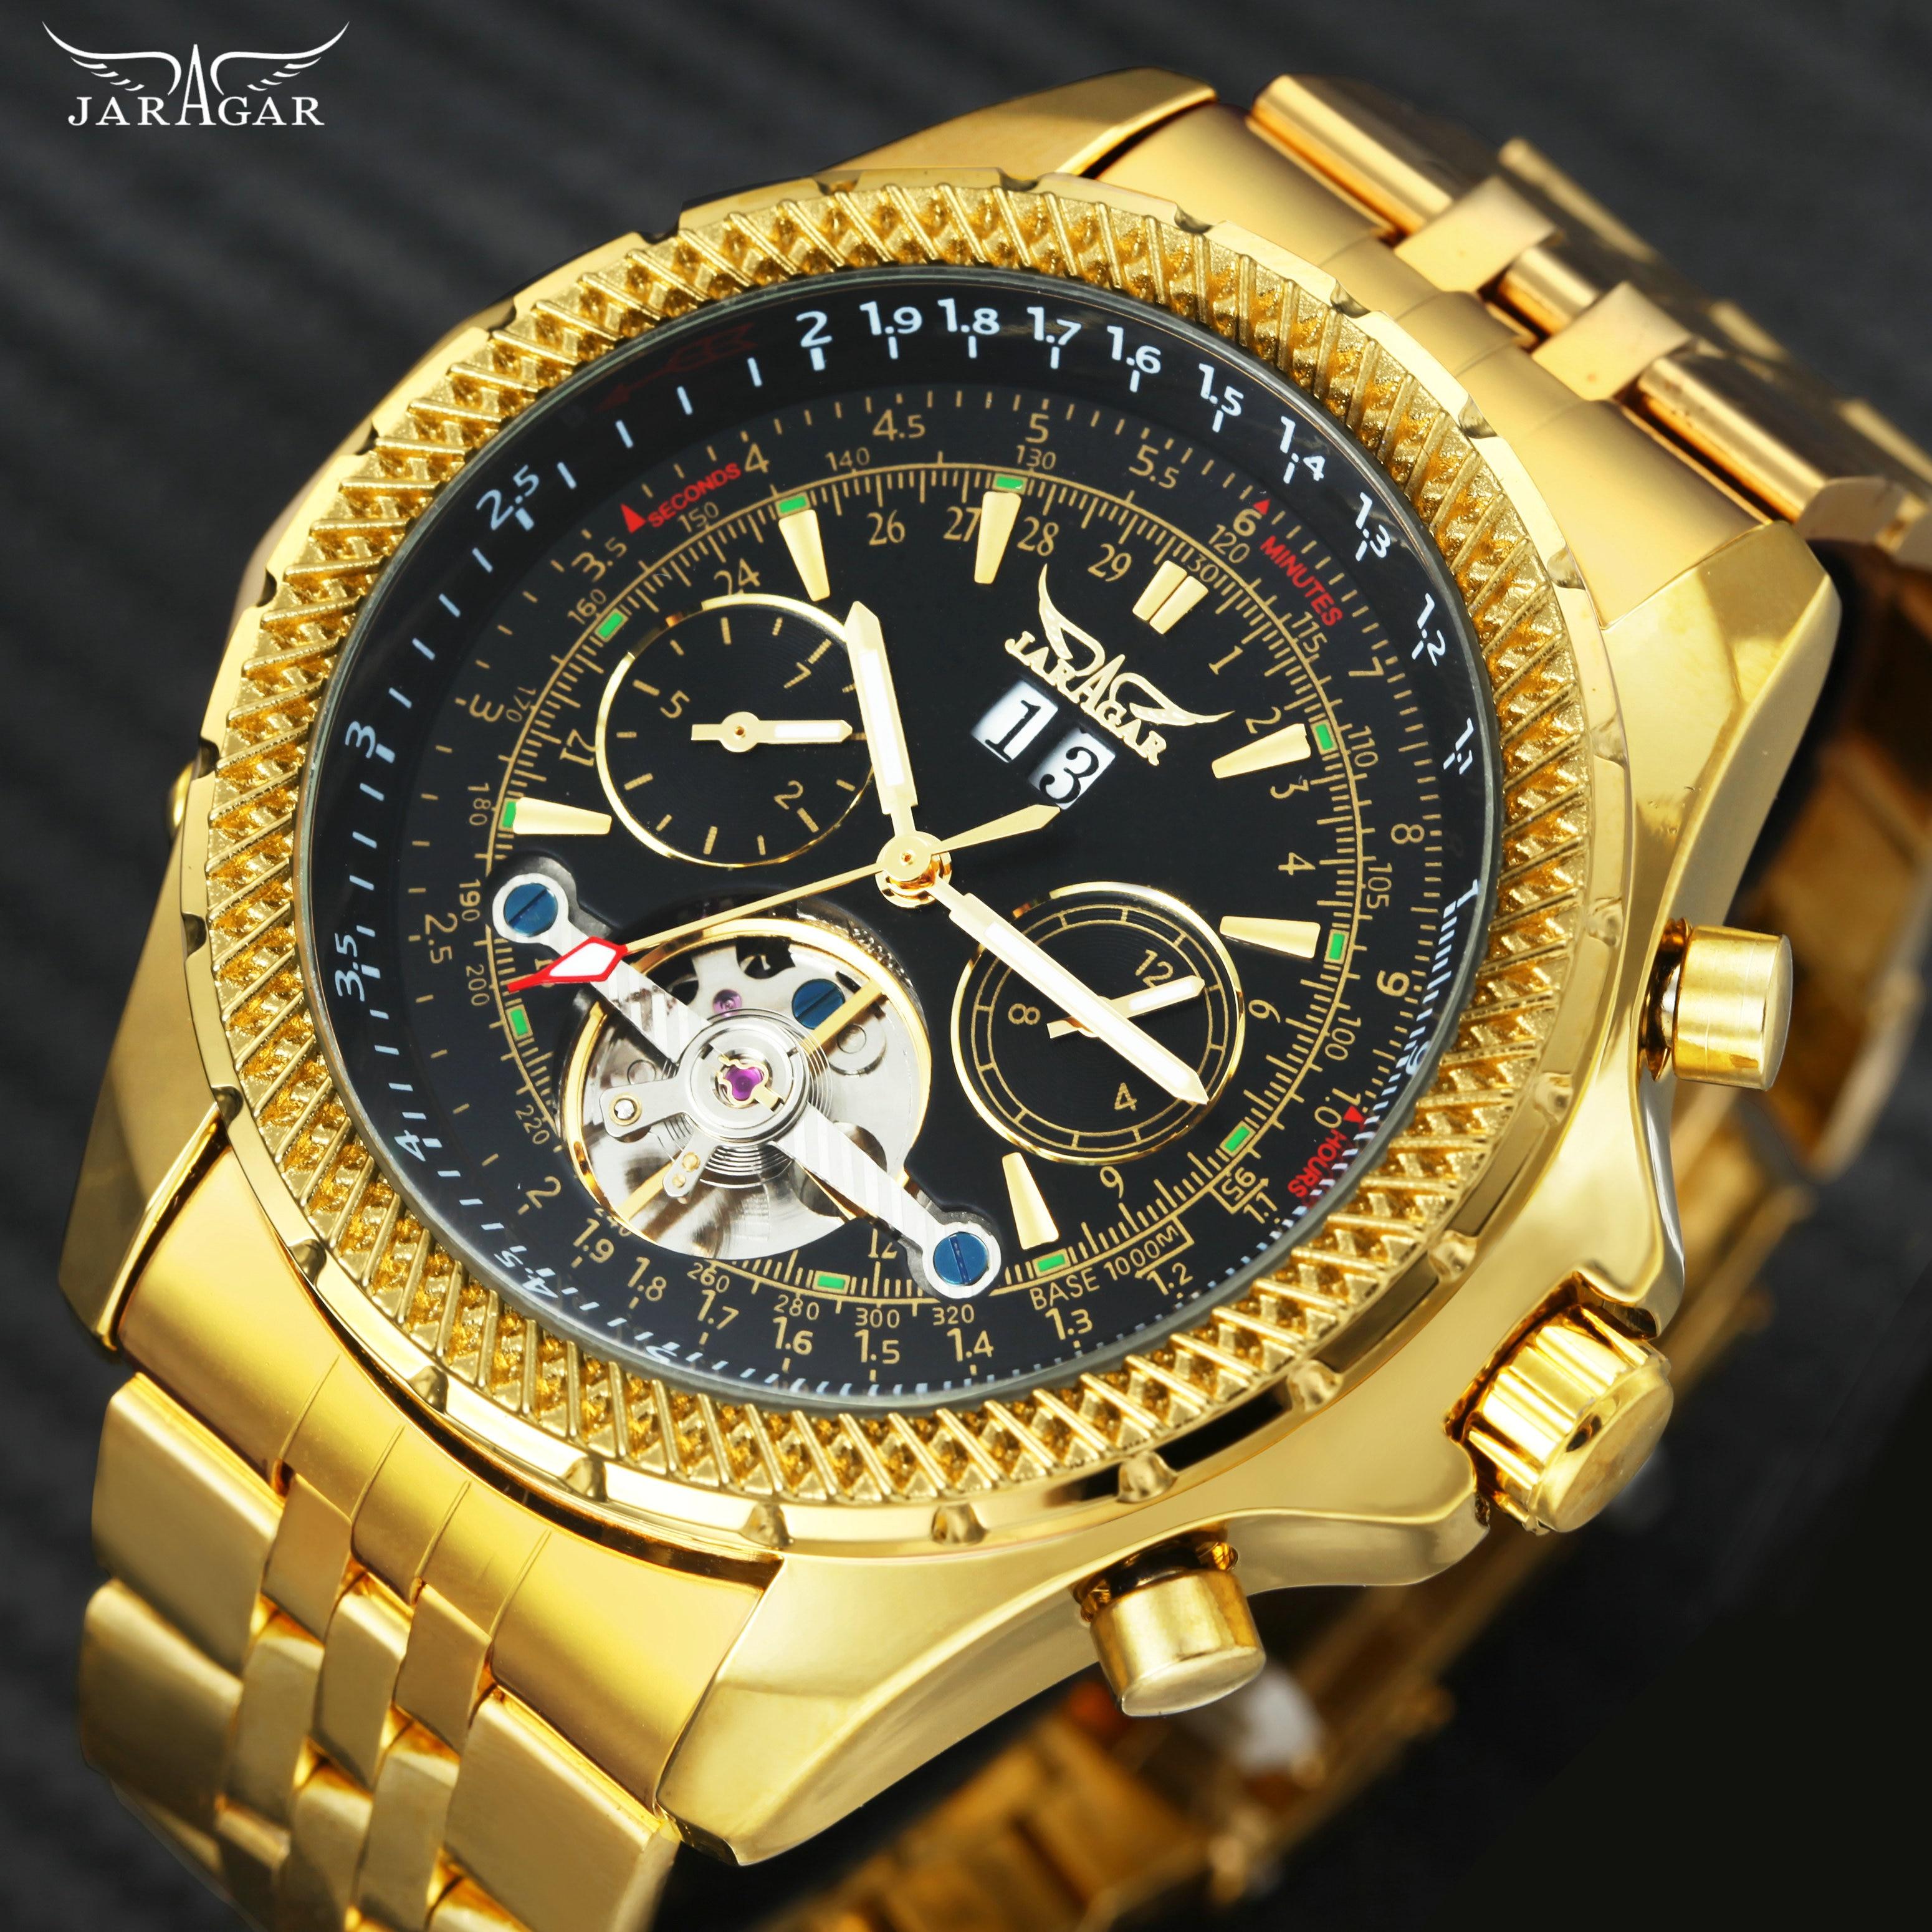 все цены на JARAGAR Royal Golden Automatic Mechanical Watch Men Tourbillon Design 2 Sub-dials Display Top Brand Luxury Full Steel Wristwatch онлайн